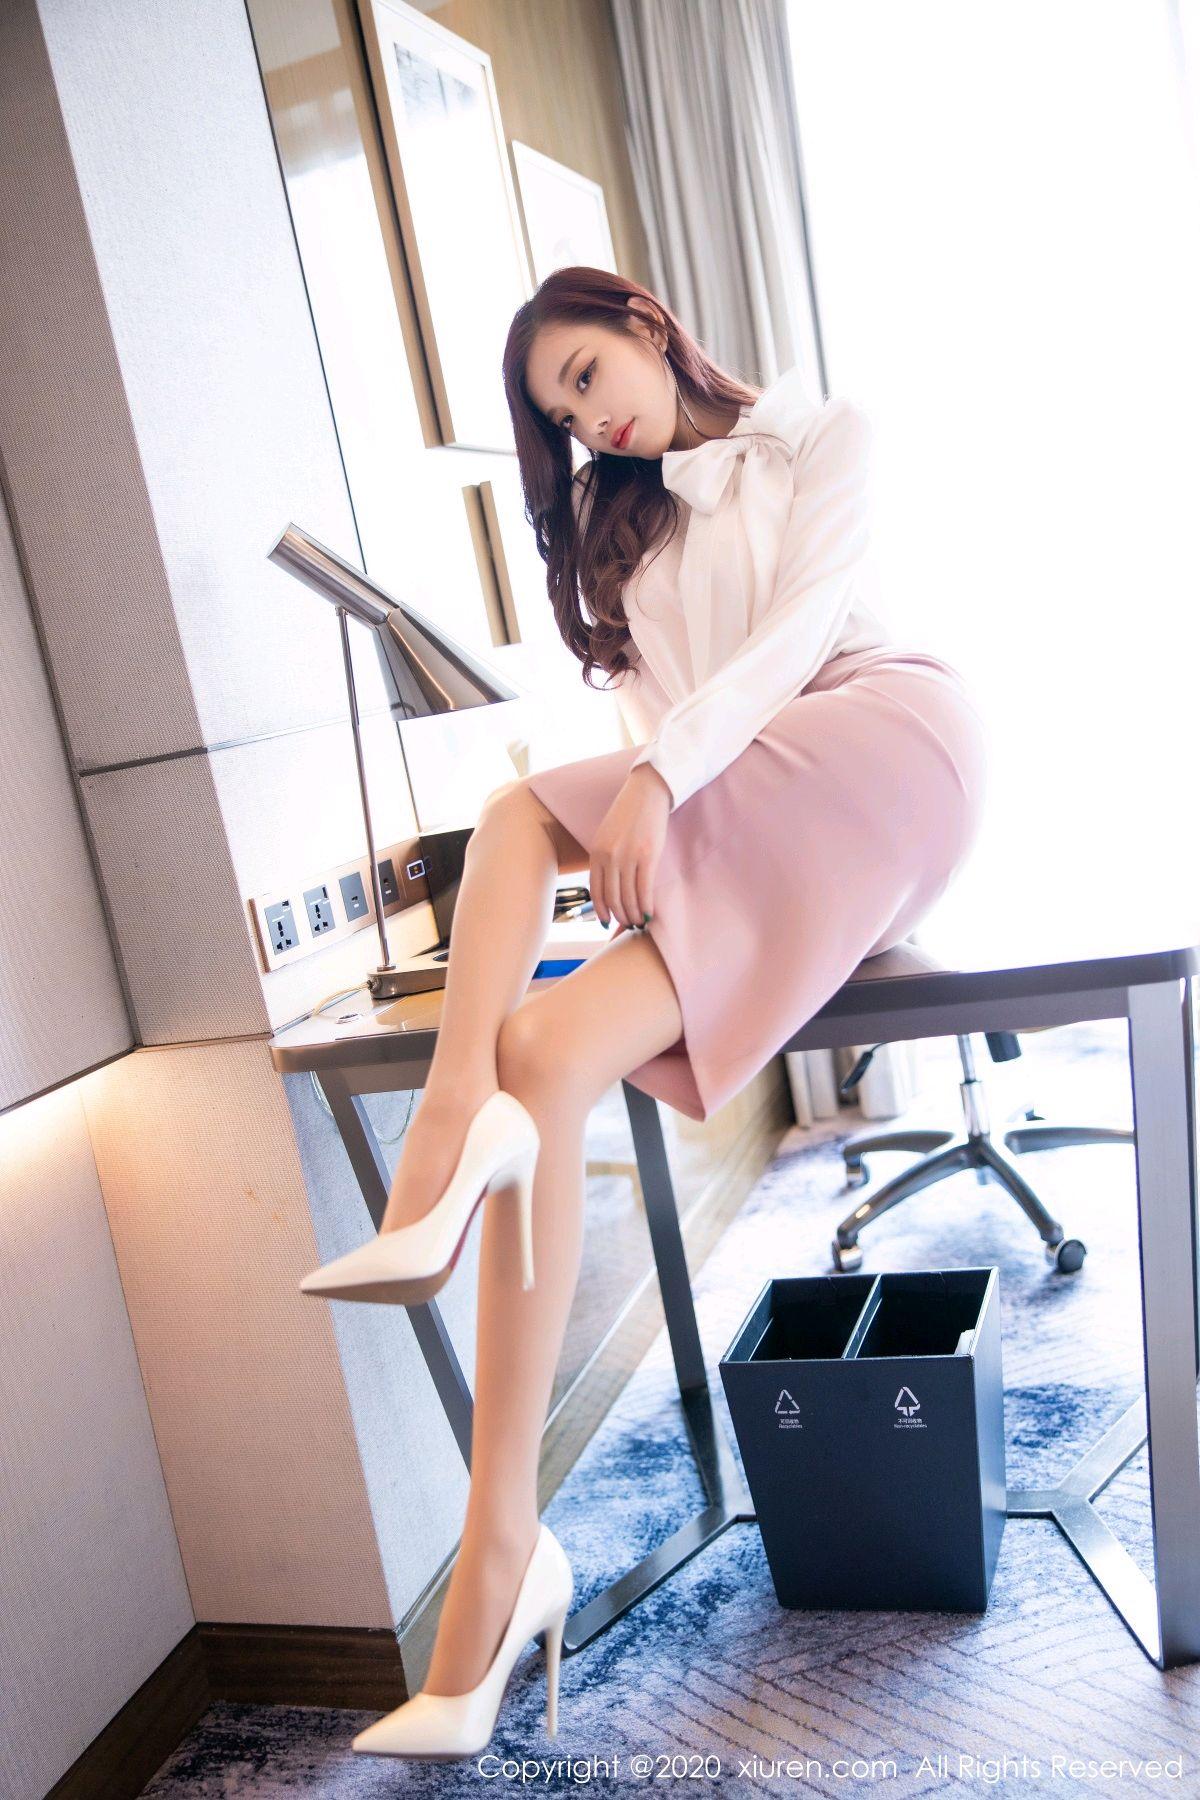 [XiuRen] Vol.2431 Yang Chen Chen 18P, Tall, Underwear, Uniform, Xiuren, Yang Chen Chen